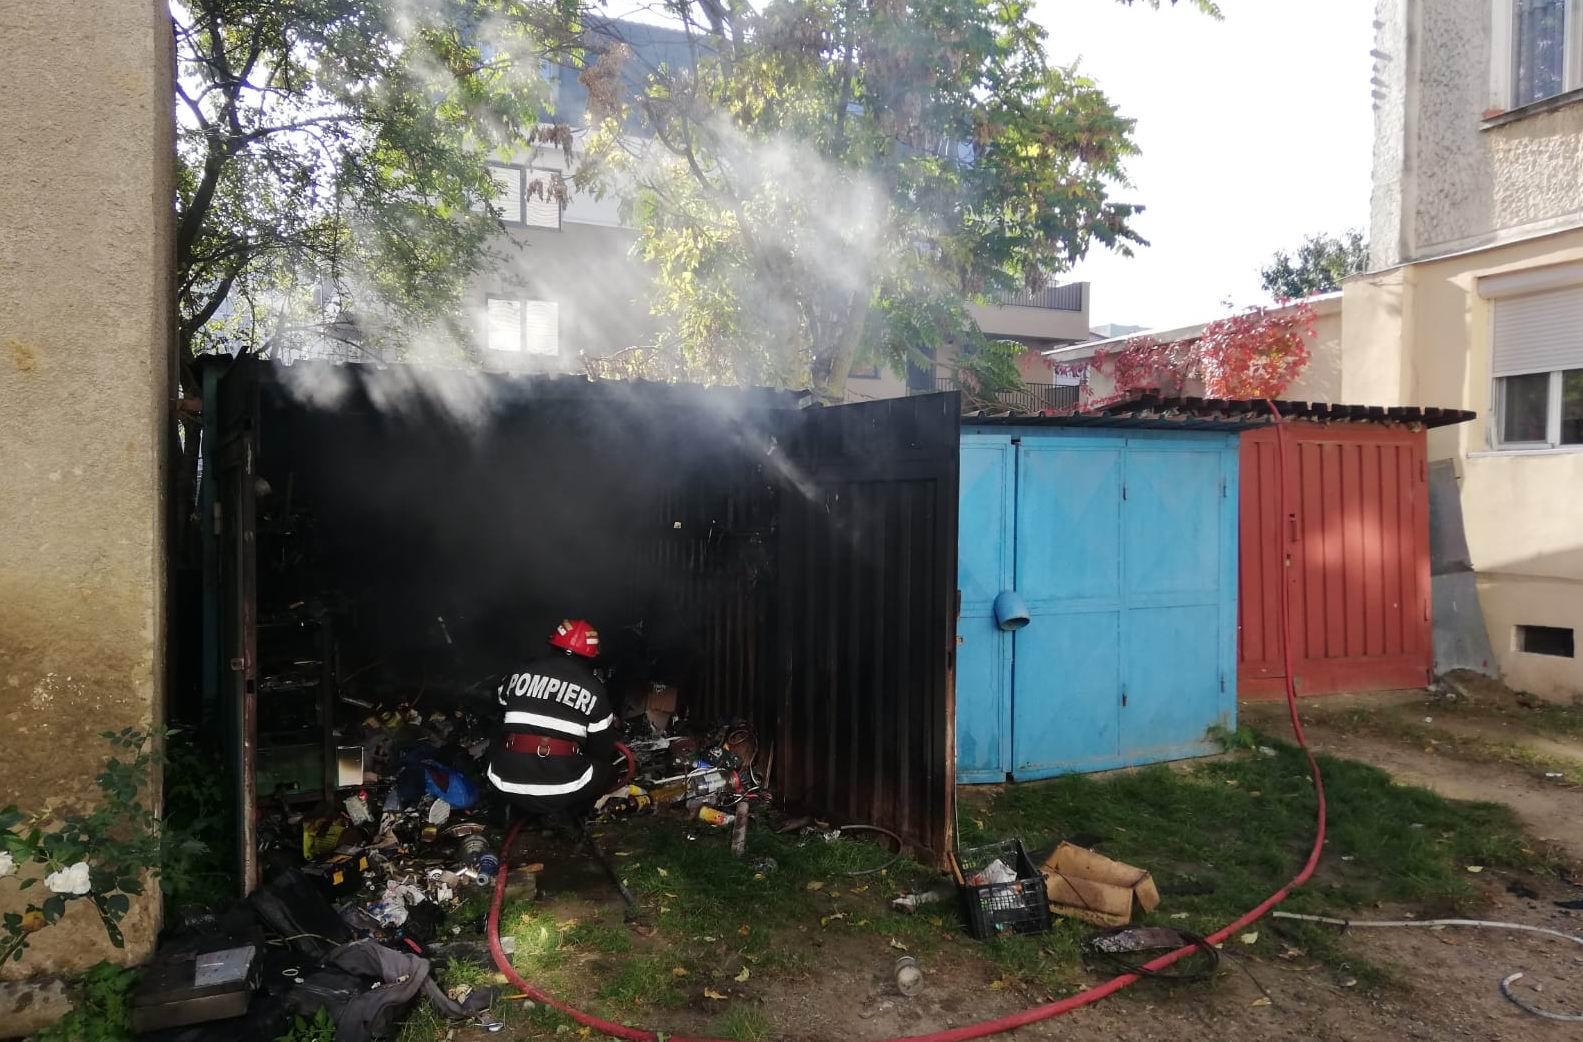 Incendiu la un garaj, de la un aparat de sudură